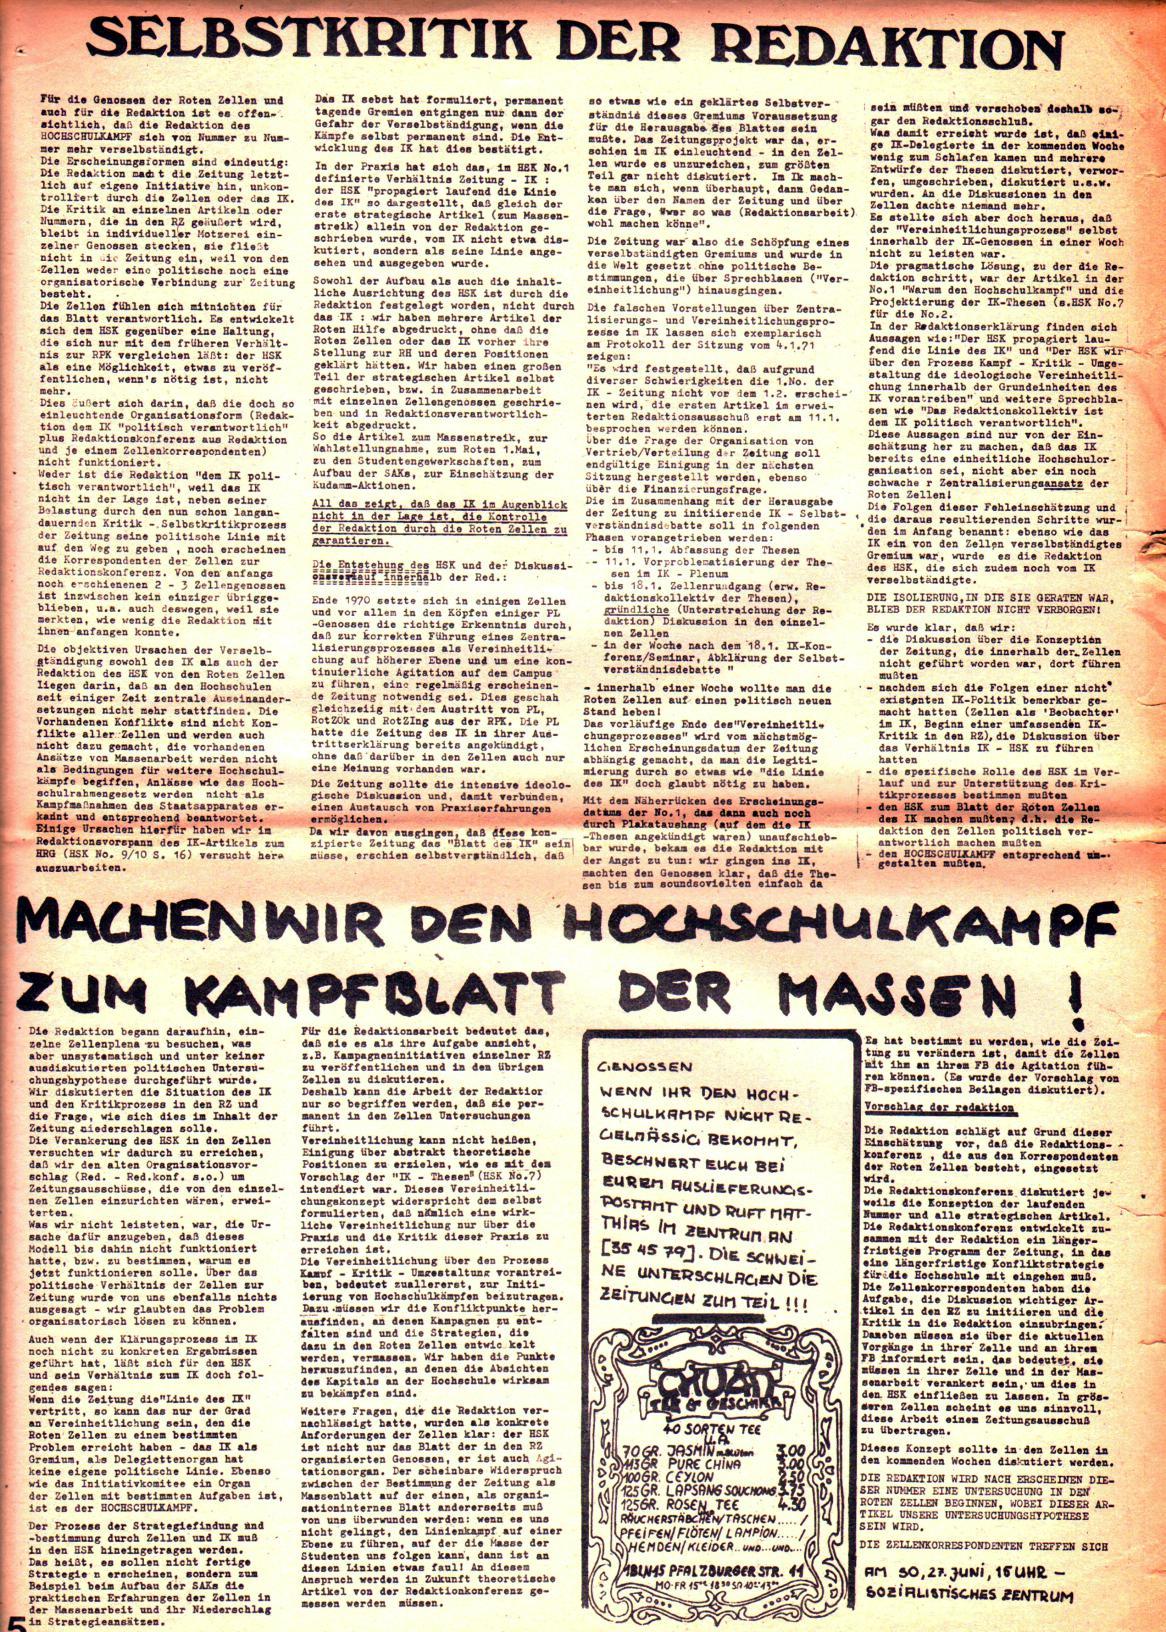 Berlin_Hochschulkampf_1971_11_05